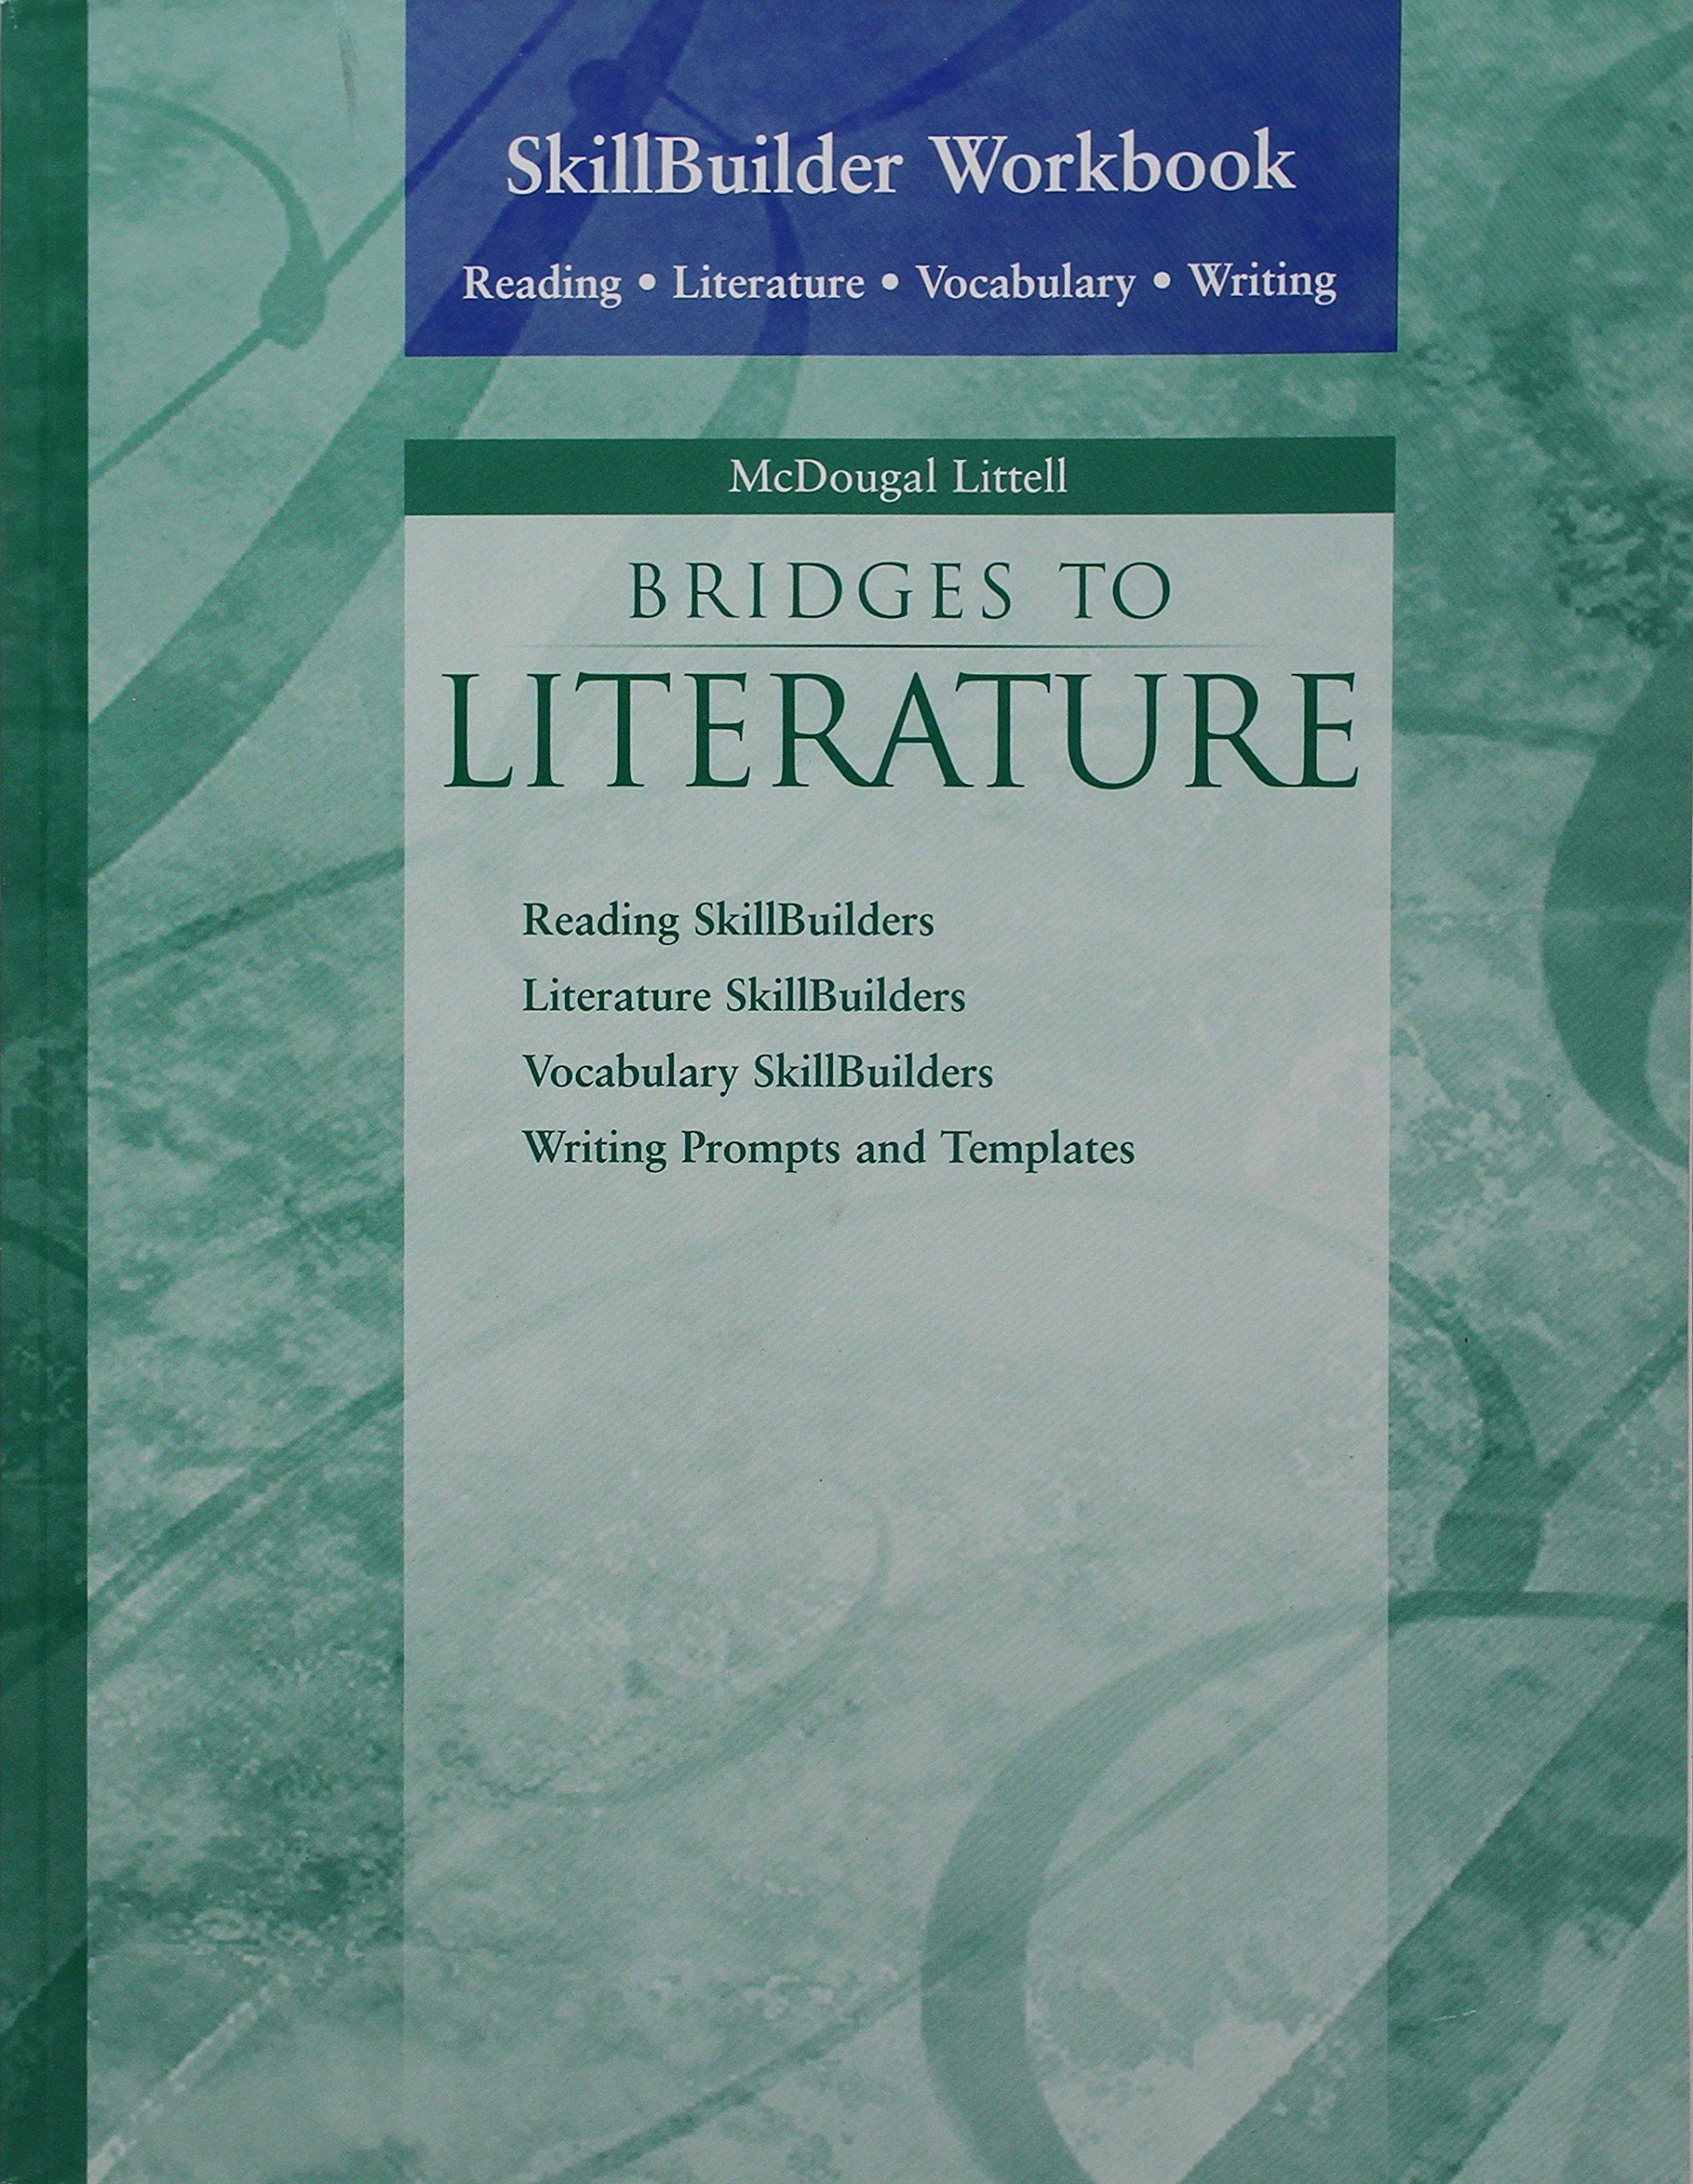 Bridges to Literature, Level III: SkillBuilder Workbook ebook